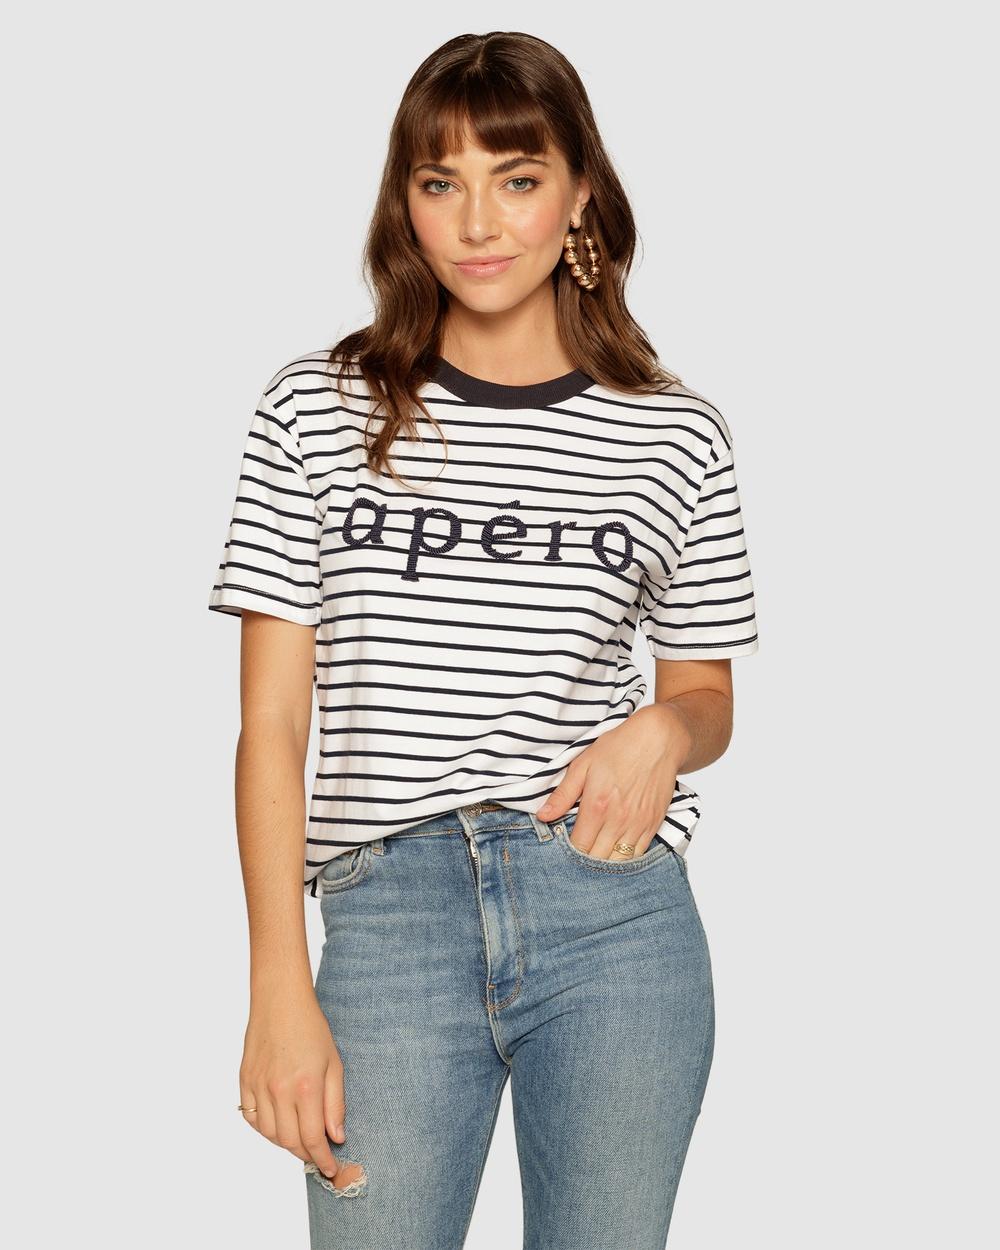 Apero Label - Apero Stripe Beaded T Shirt - T-Shirts & Singlets (Navy) Apero Stripe Beaded T-Shirt